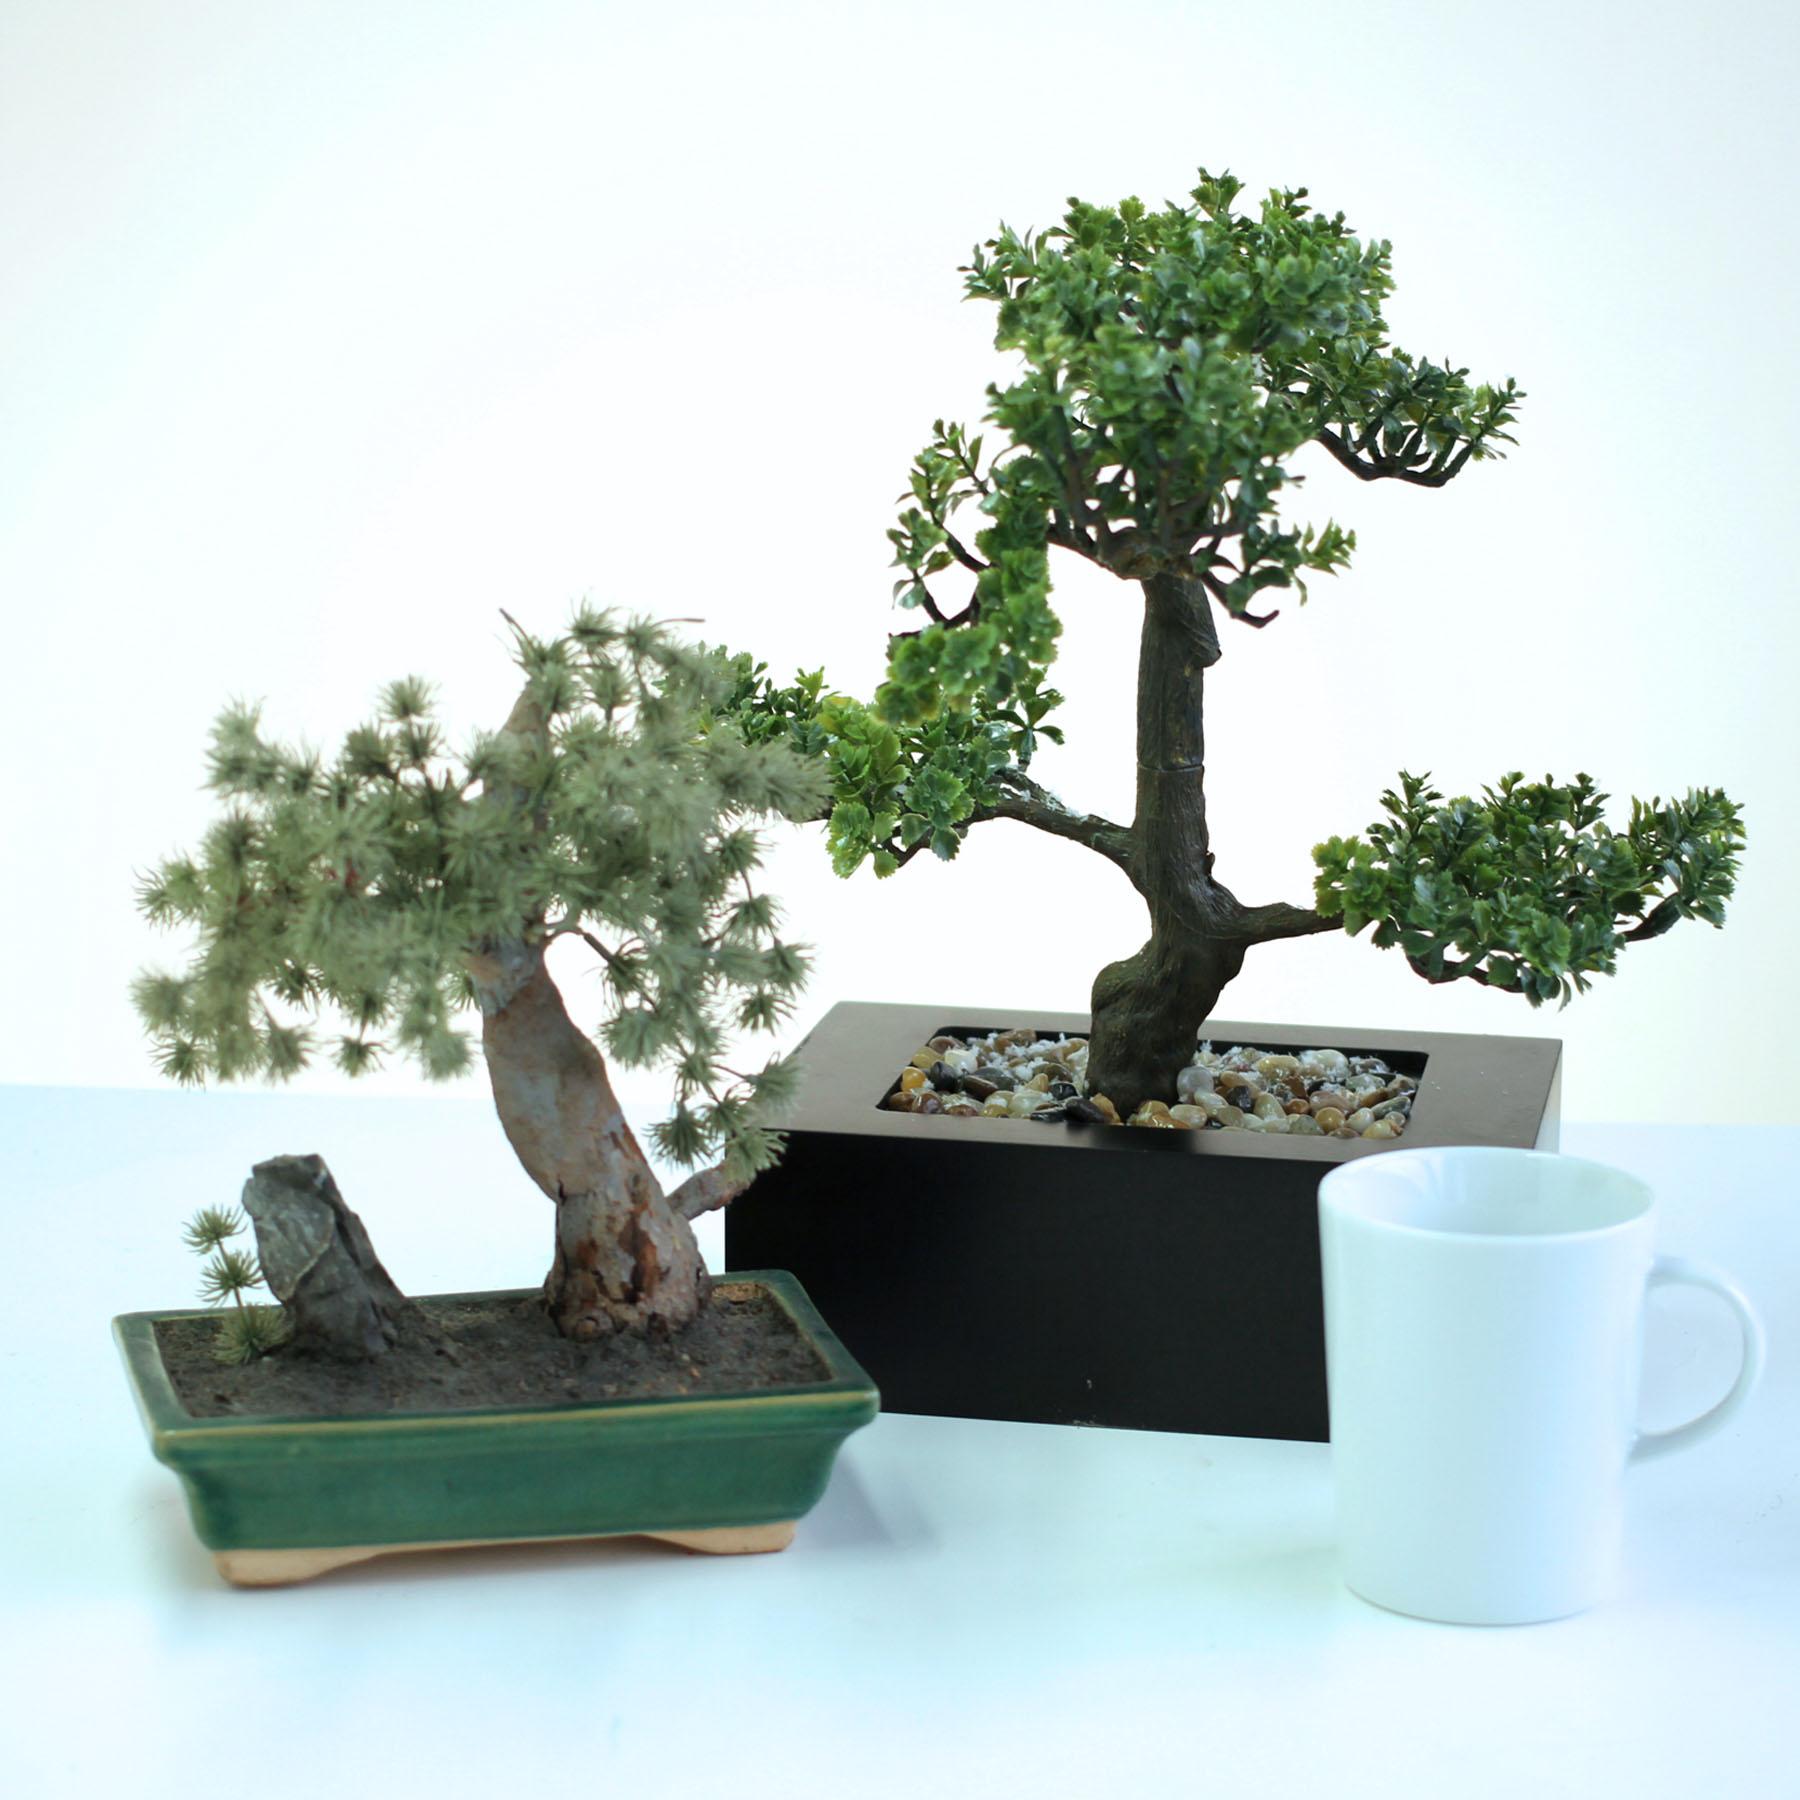 Plants. Pots. Greenery. Gardening.